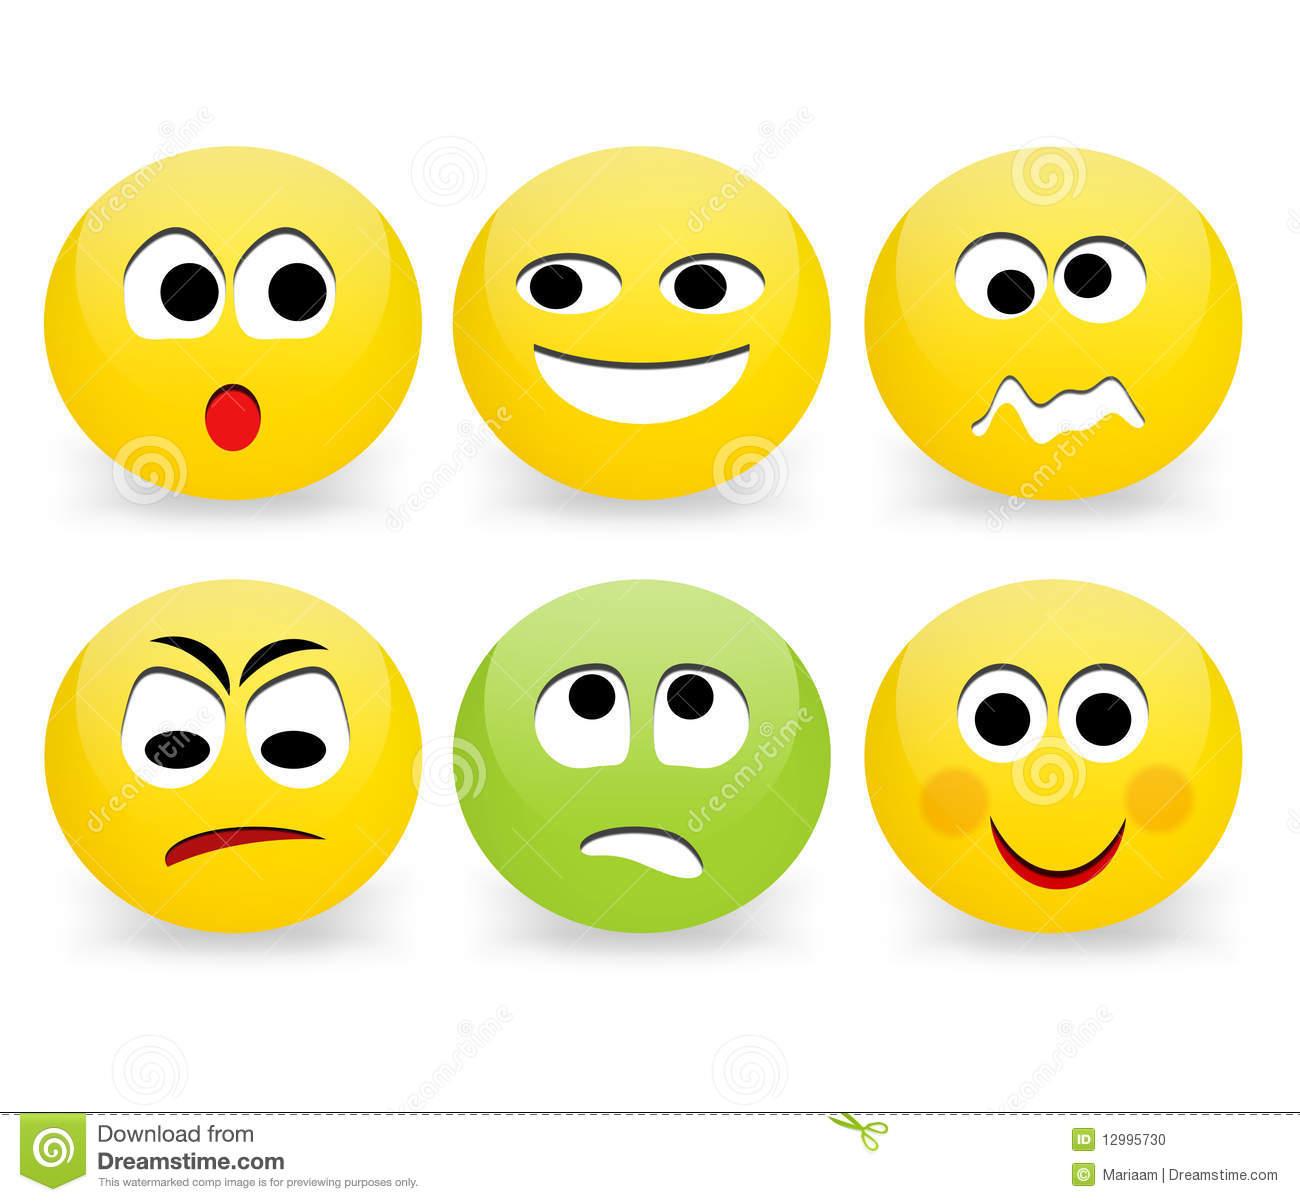 Clipart feelings vector royalty free Feelings Clip Art Free | Clipart Panda - Free Clipart Images vector royalty free